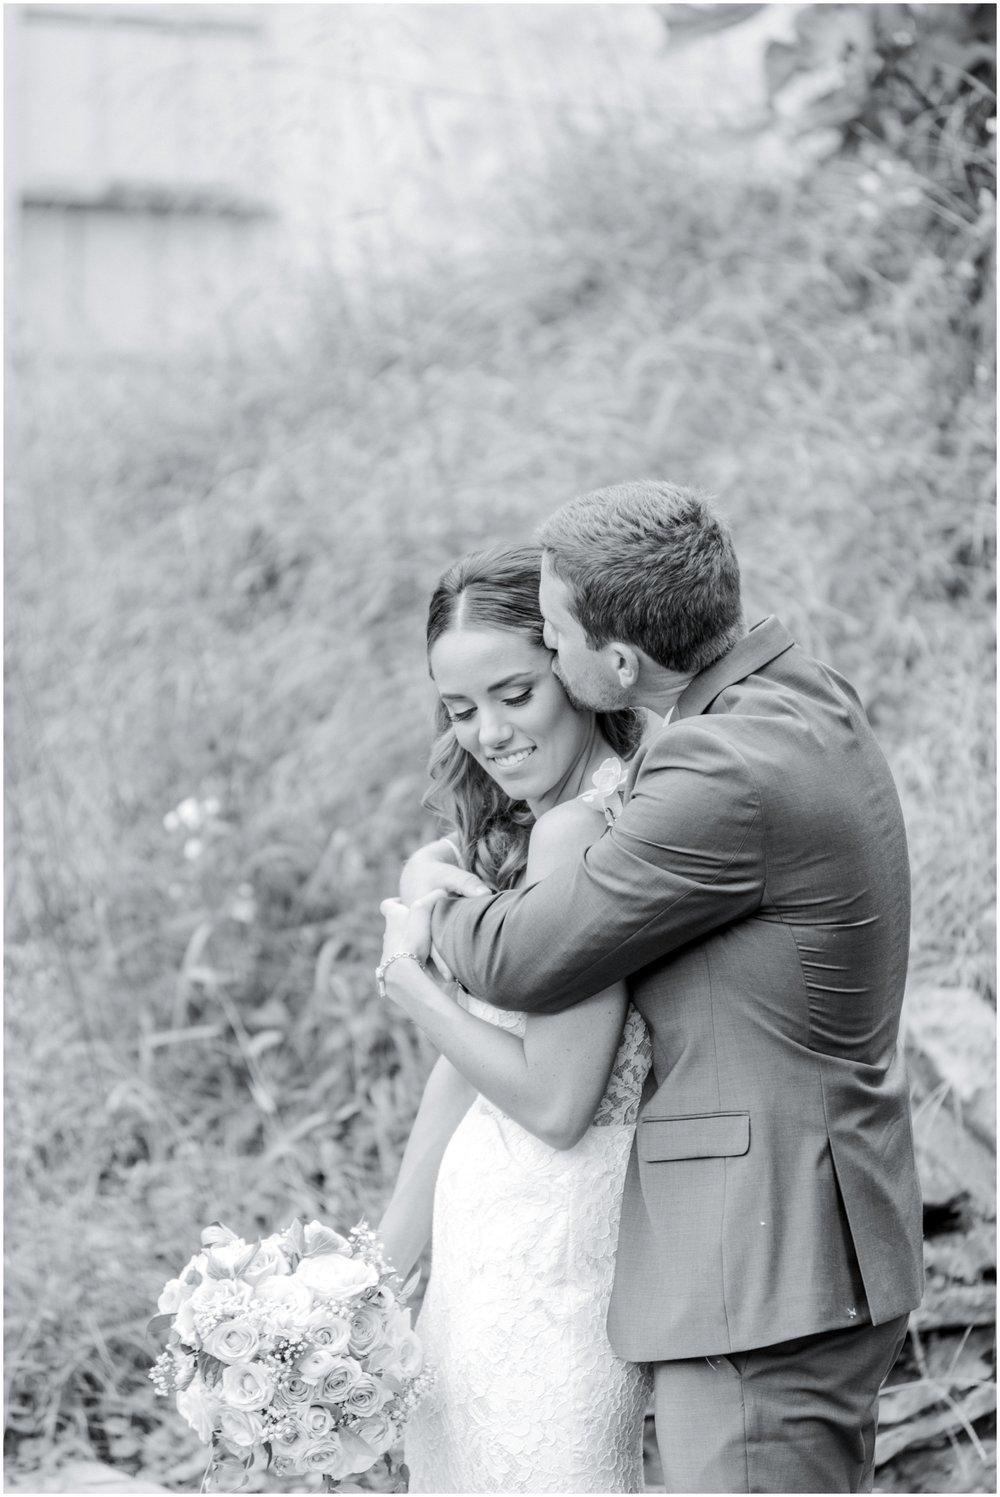 Summer Wedding at Philander Chase Knox Estate in Malvern, PA - Krista Brackin Photography_0069.jpg